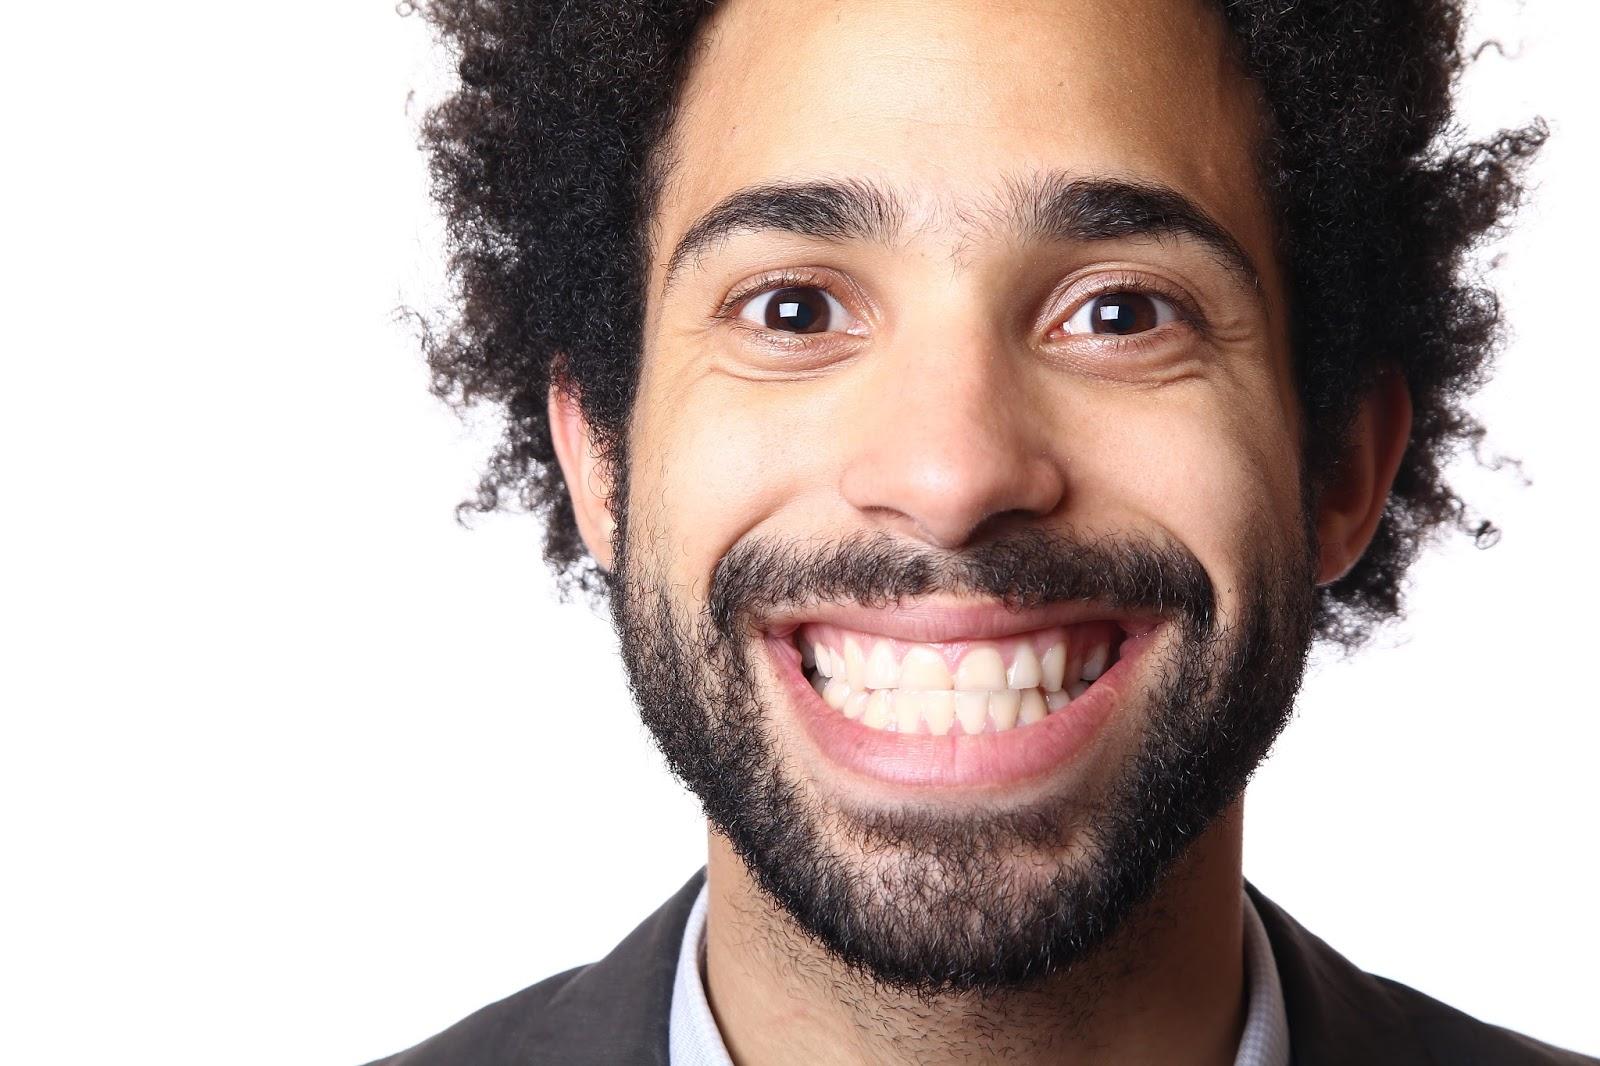 emergency dentist glasgow saves a mans smile